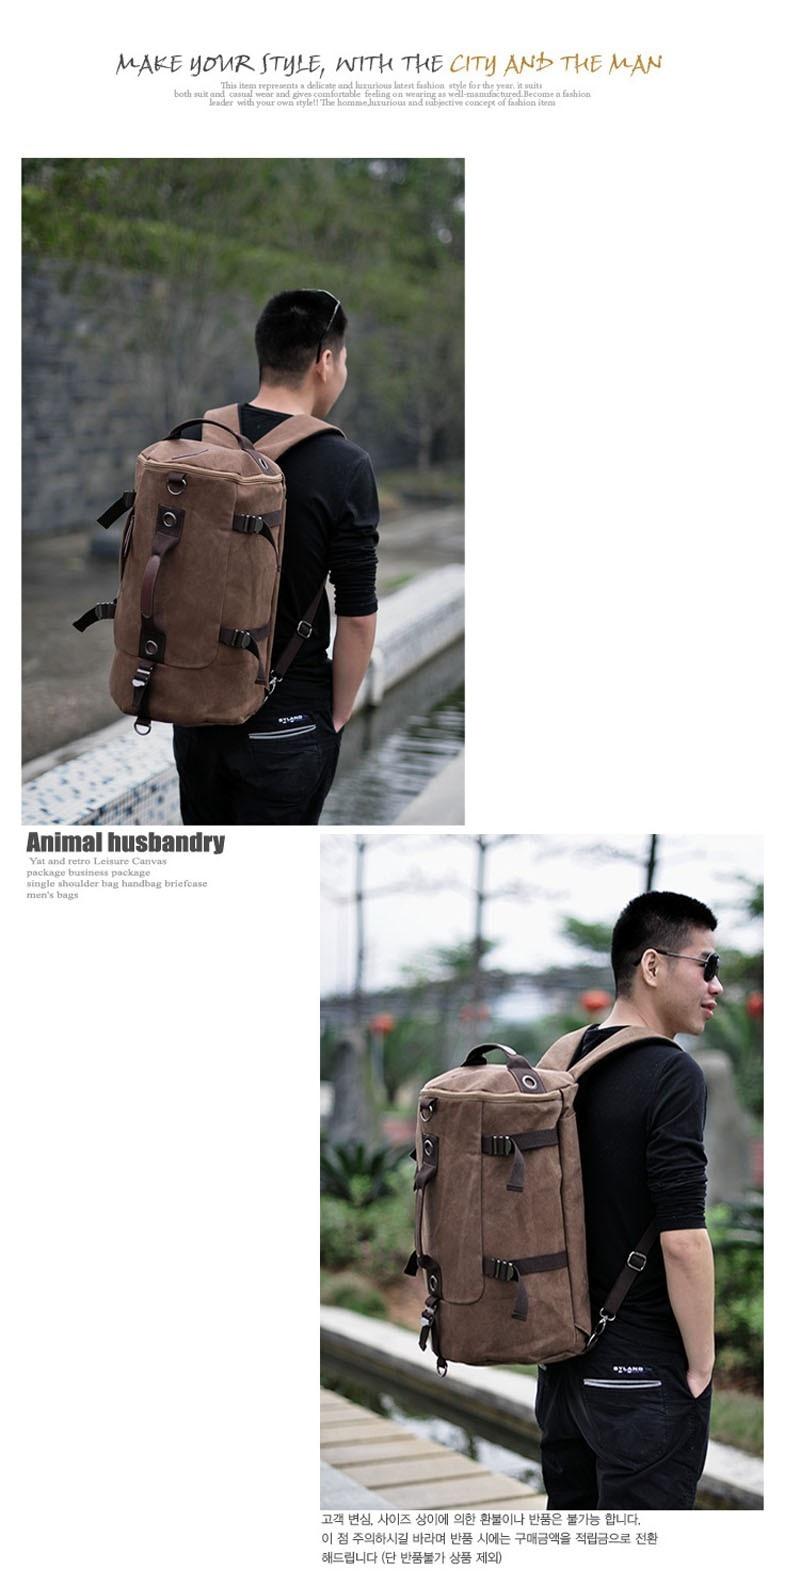 Men's Multi-Functional Backpack Vintage Shoulder Bag High Quality Canvas Male Bagpack Rucksack Travel Luggage for Weekend 35